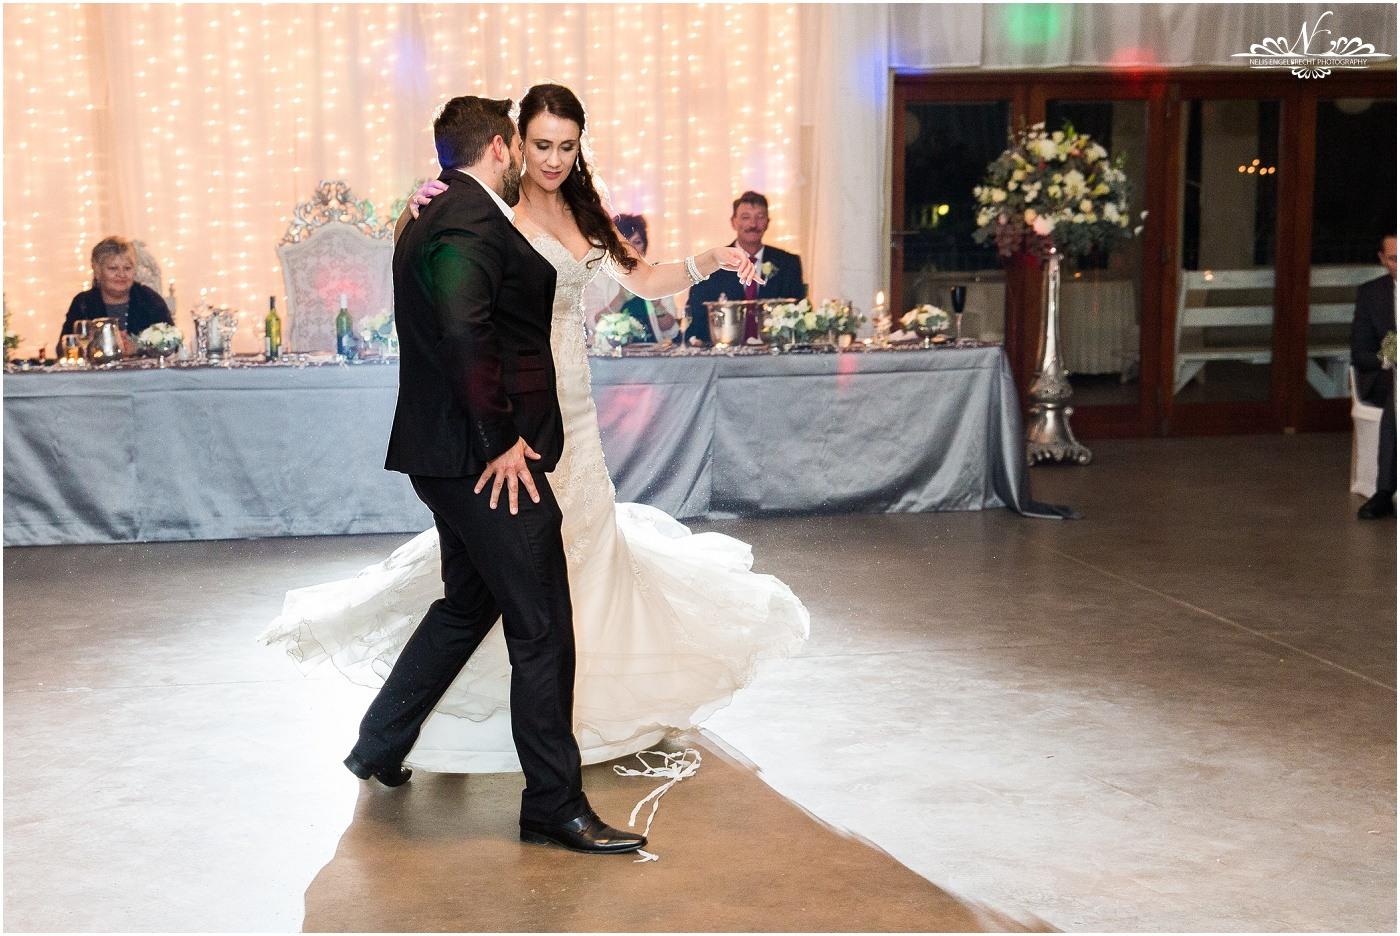 Eensgezind-Wedding-Photos-Nelis-Engelbrecht-Photography-194